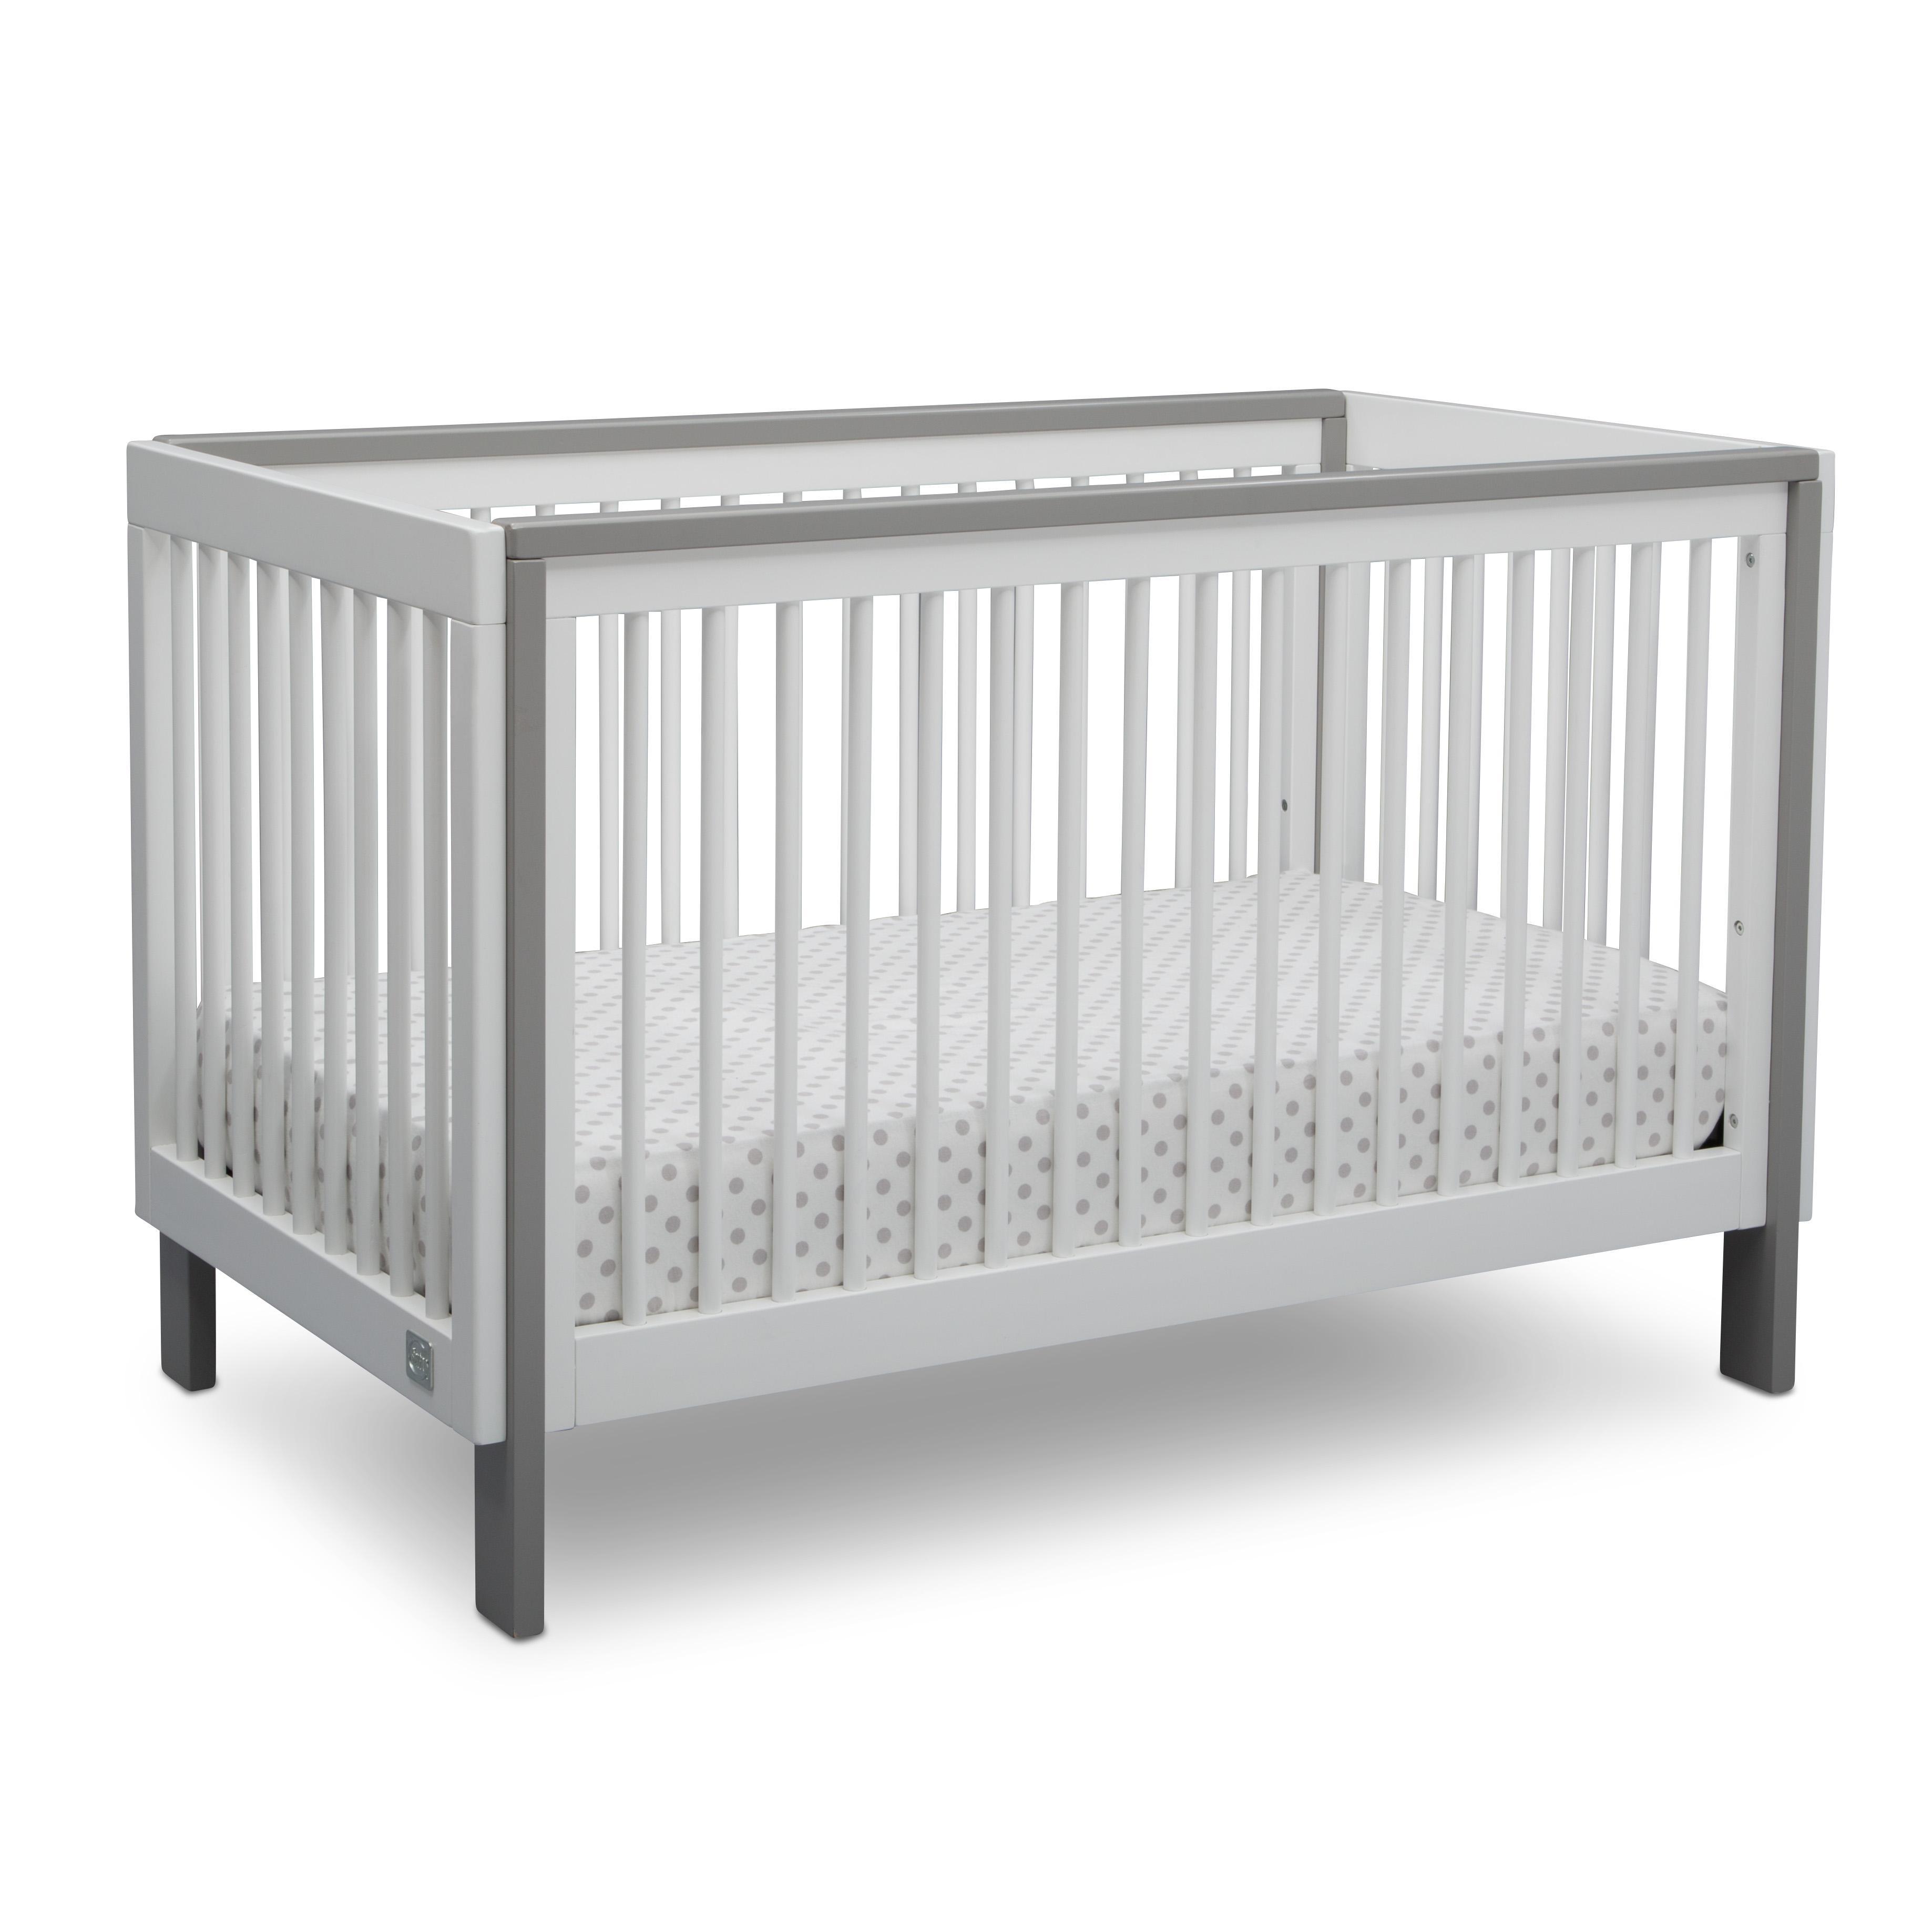 baby metal l see a la crib wayfair in pdx kids reviews trinity through convertible cribs